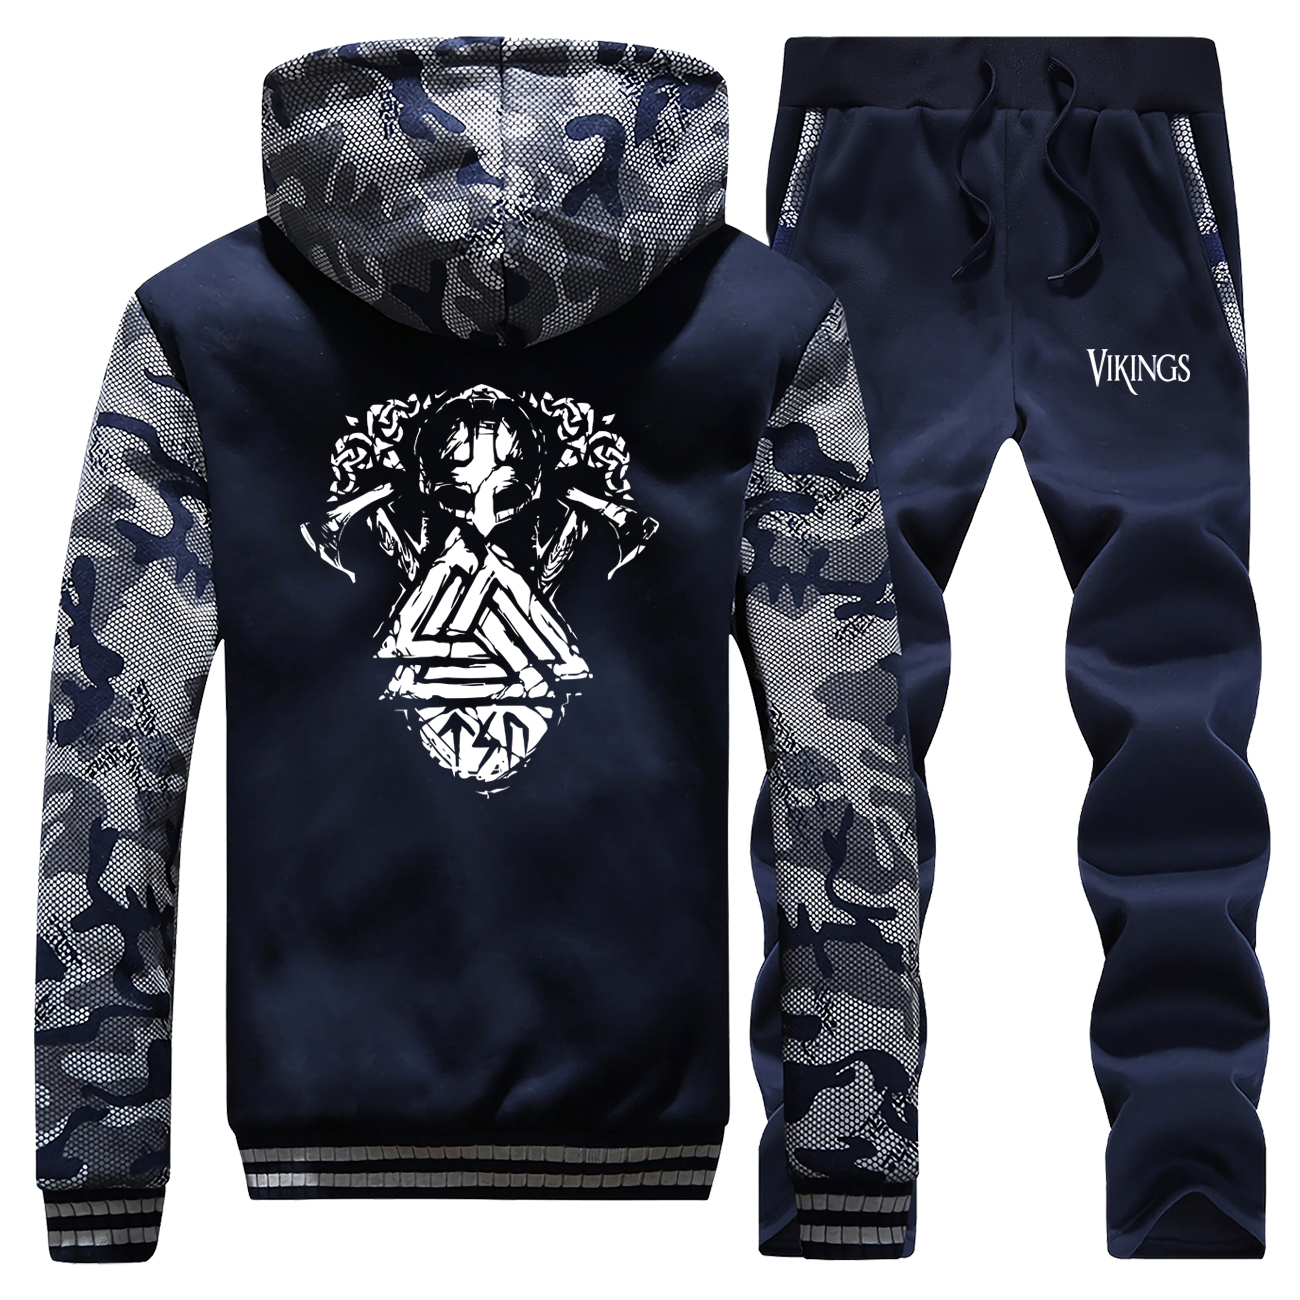 Hoodies Men Fashion Coat Thick Suit Warm Jackets Vikings New Winter 2019 Camouflage Hip Hop Mens Sportswear+Pants 2 Piece Set